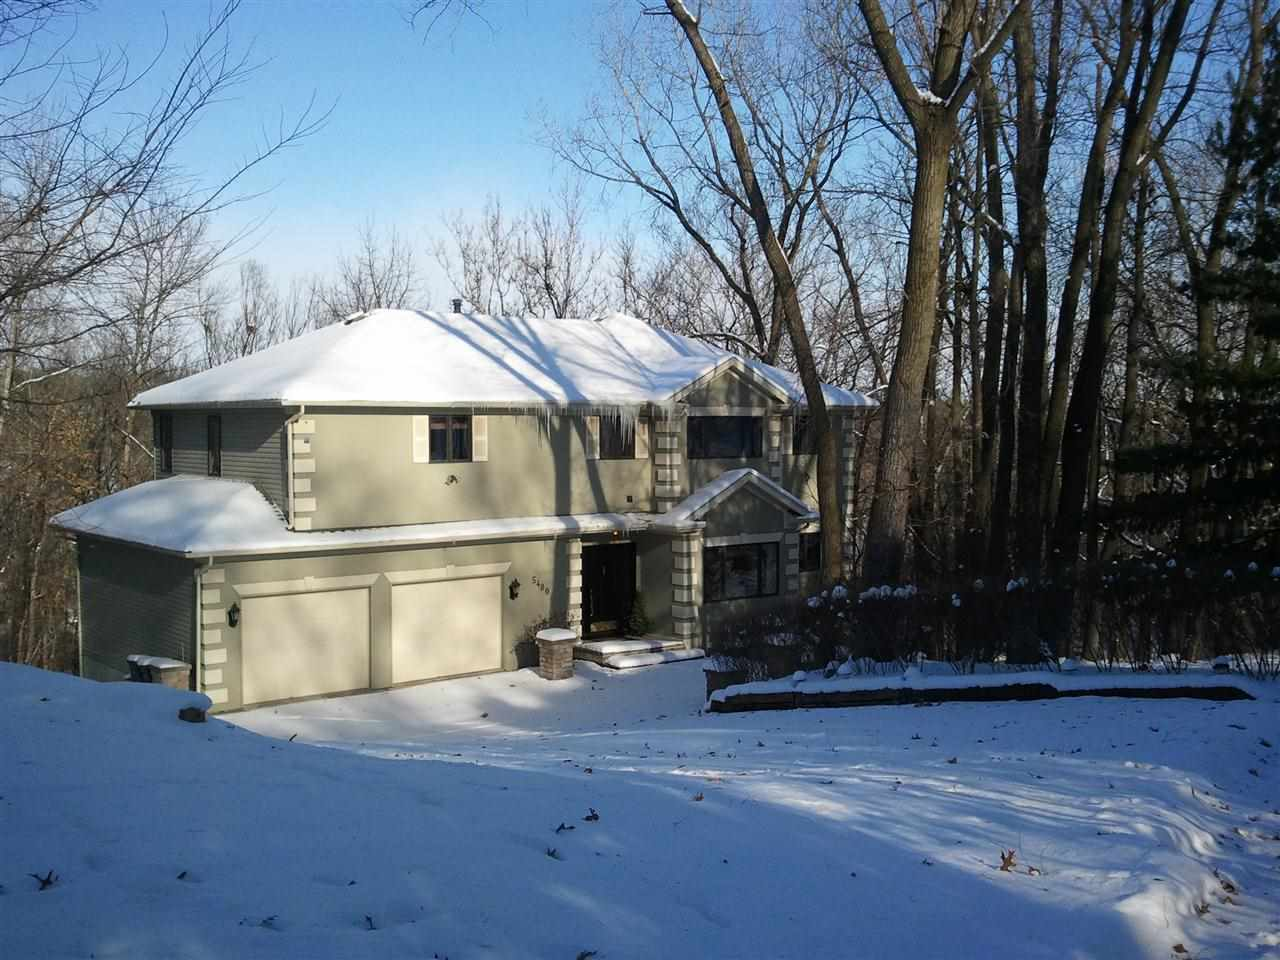 Real Estate for Sale, ListingId: 29461908, Bettendorf,IA52722